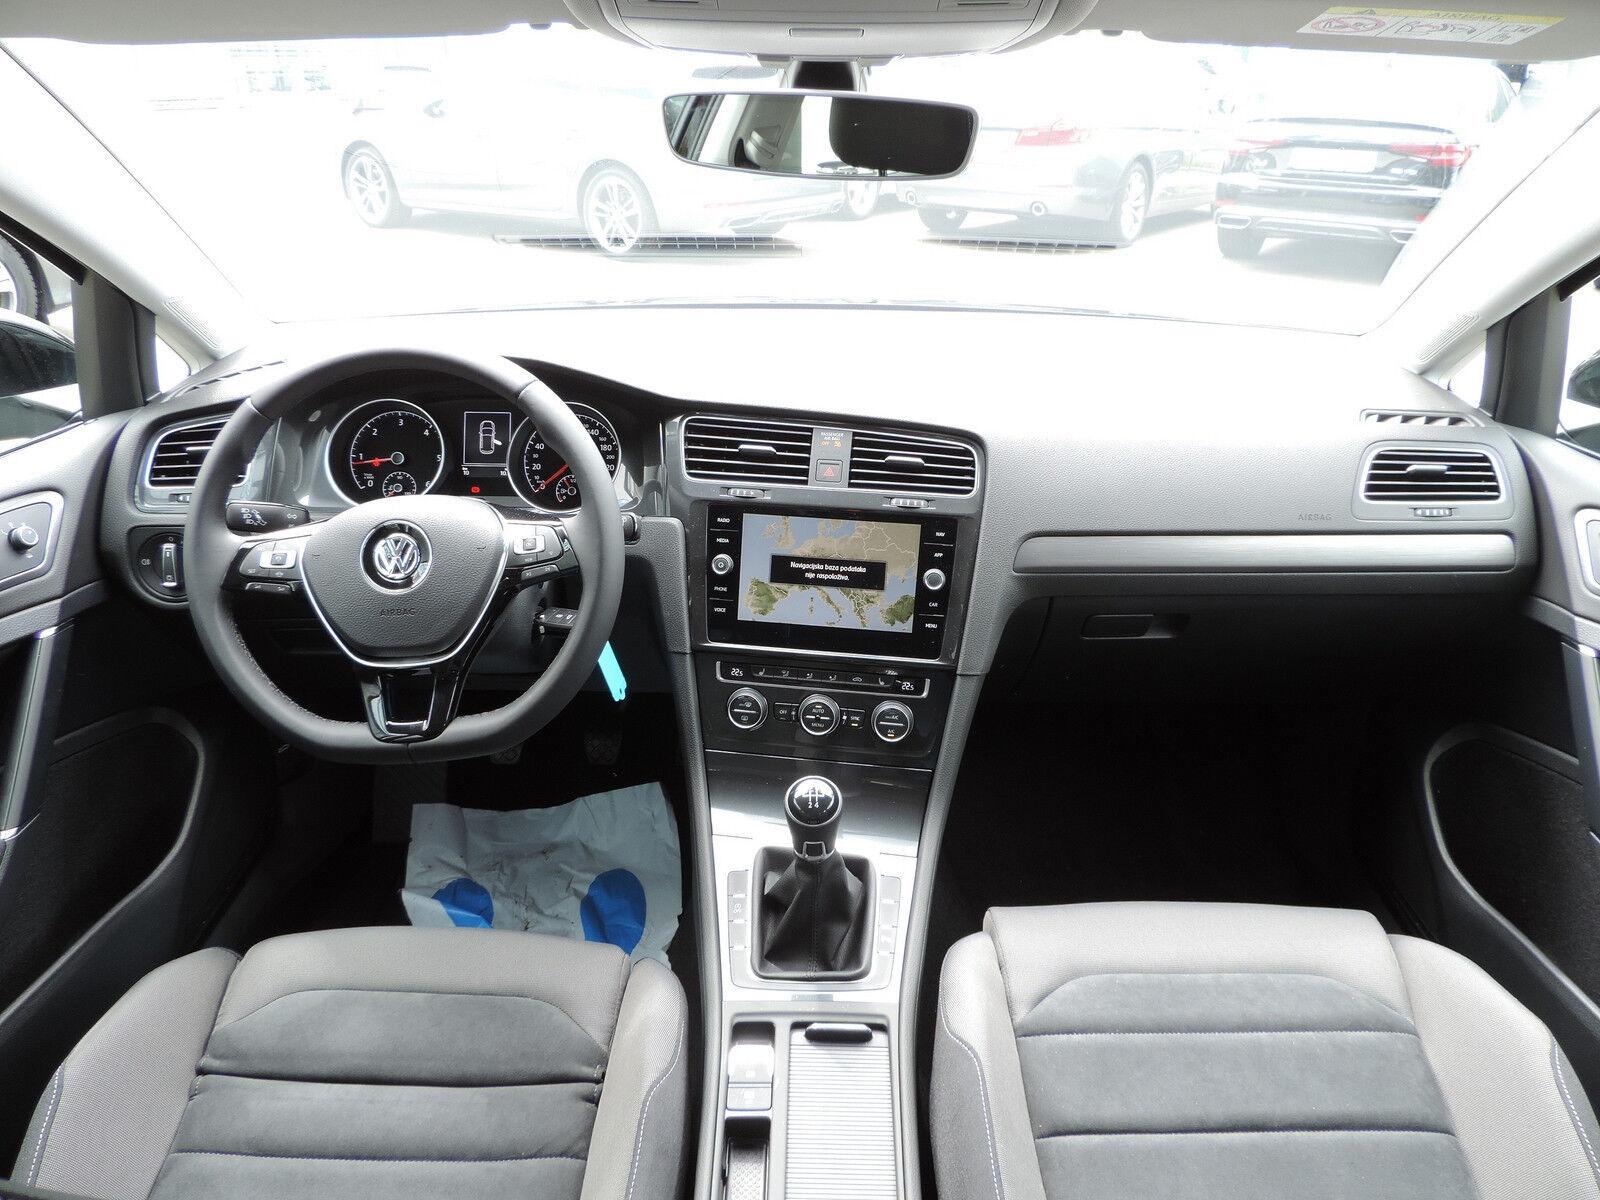 Volkswagen Golf 1.6 TDI R-LINE CLIMA REGUL ACC GPS LED NEUVE 9/15